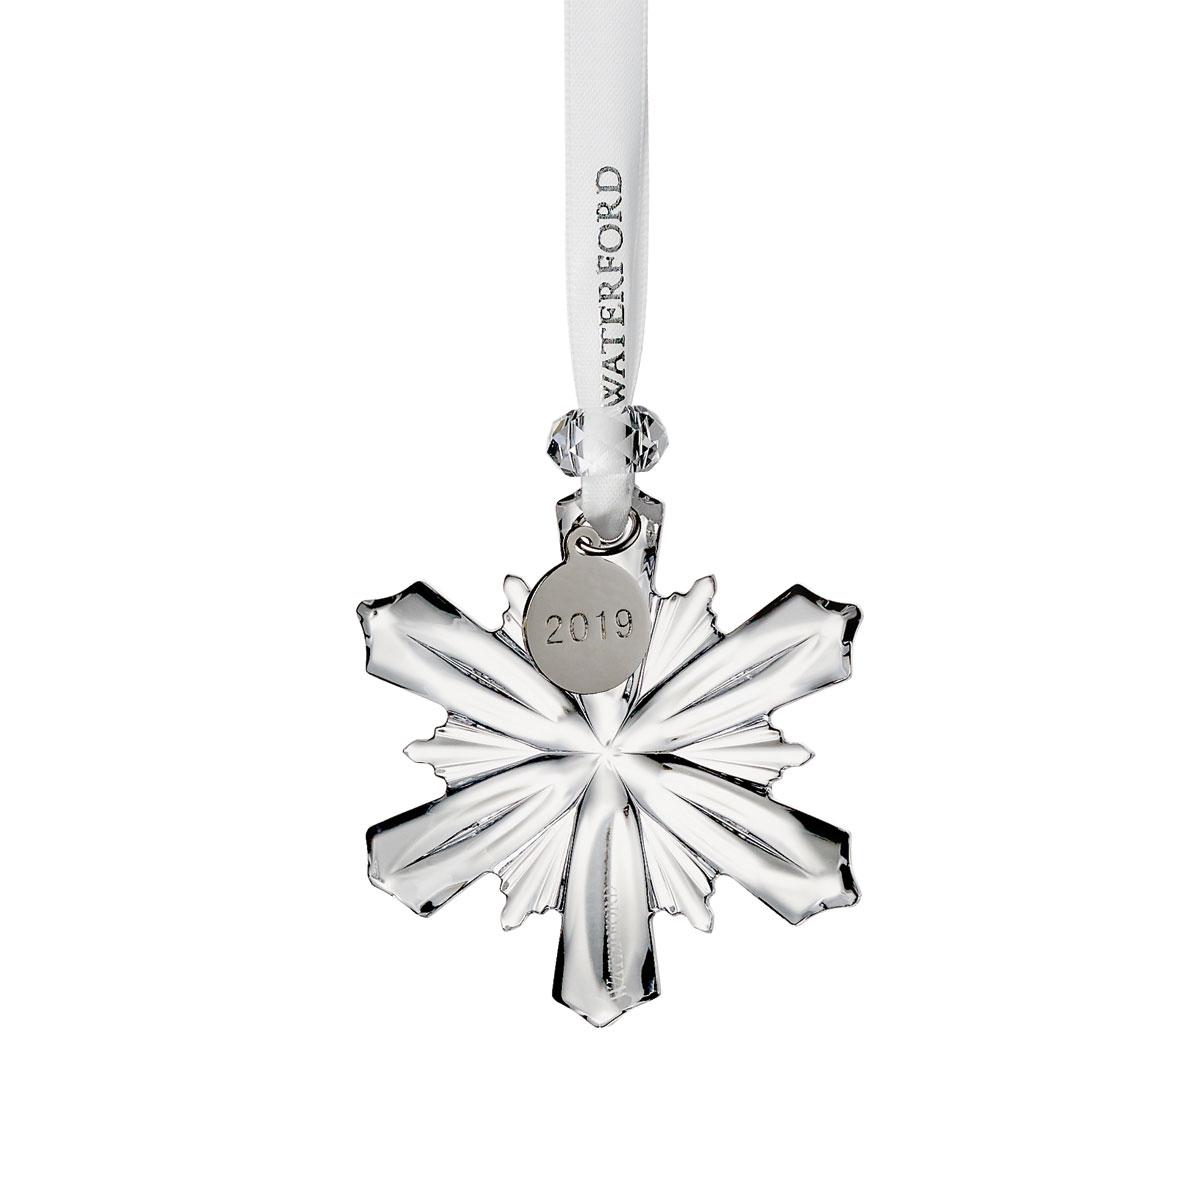 Waterford Crystal 2019 Mini Snowflake Christmas Ornament